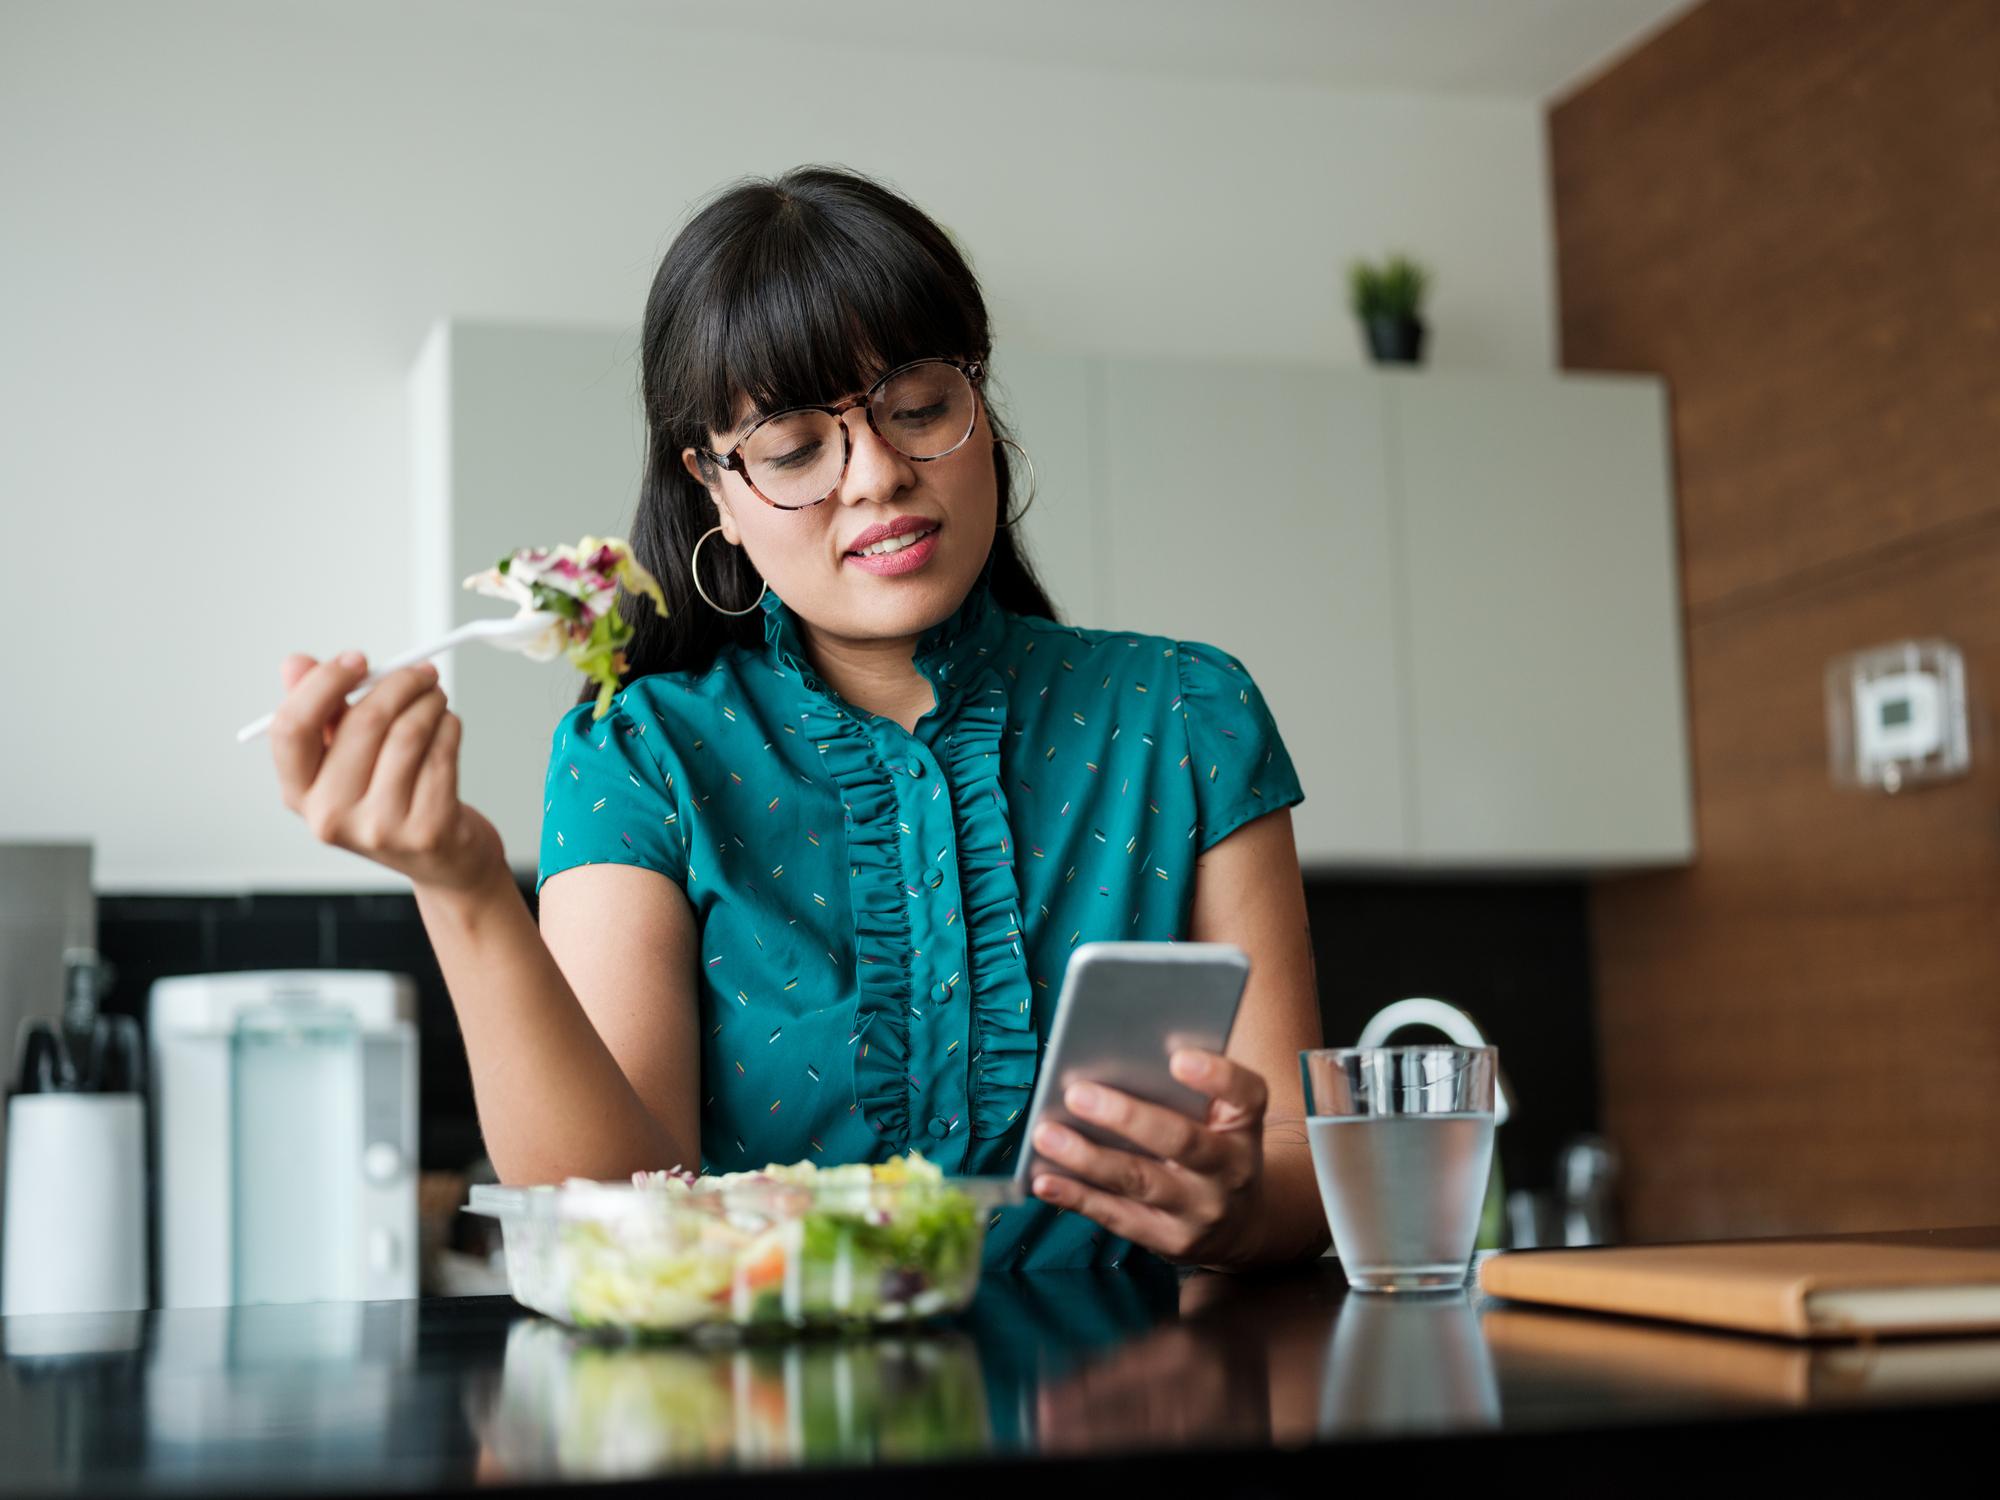 Should You Count Calories?